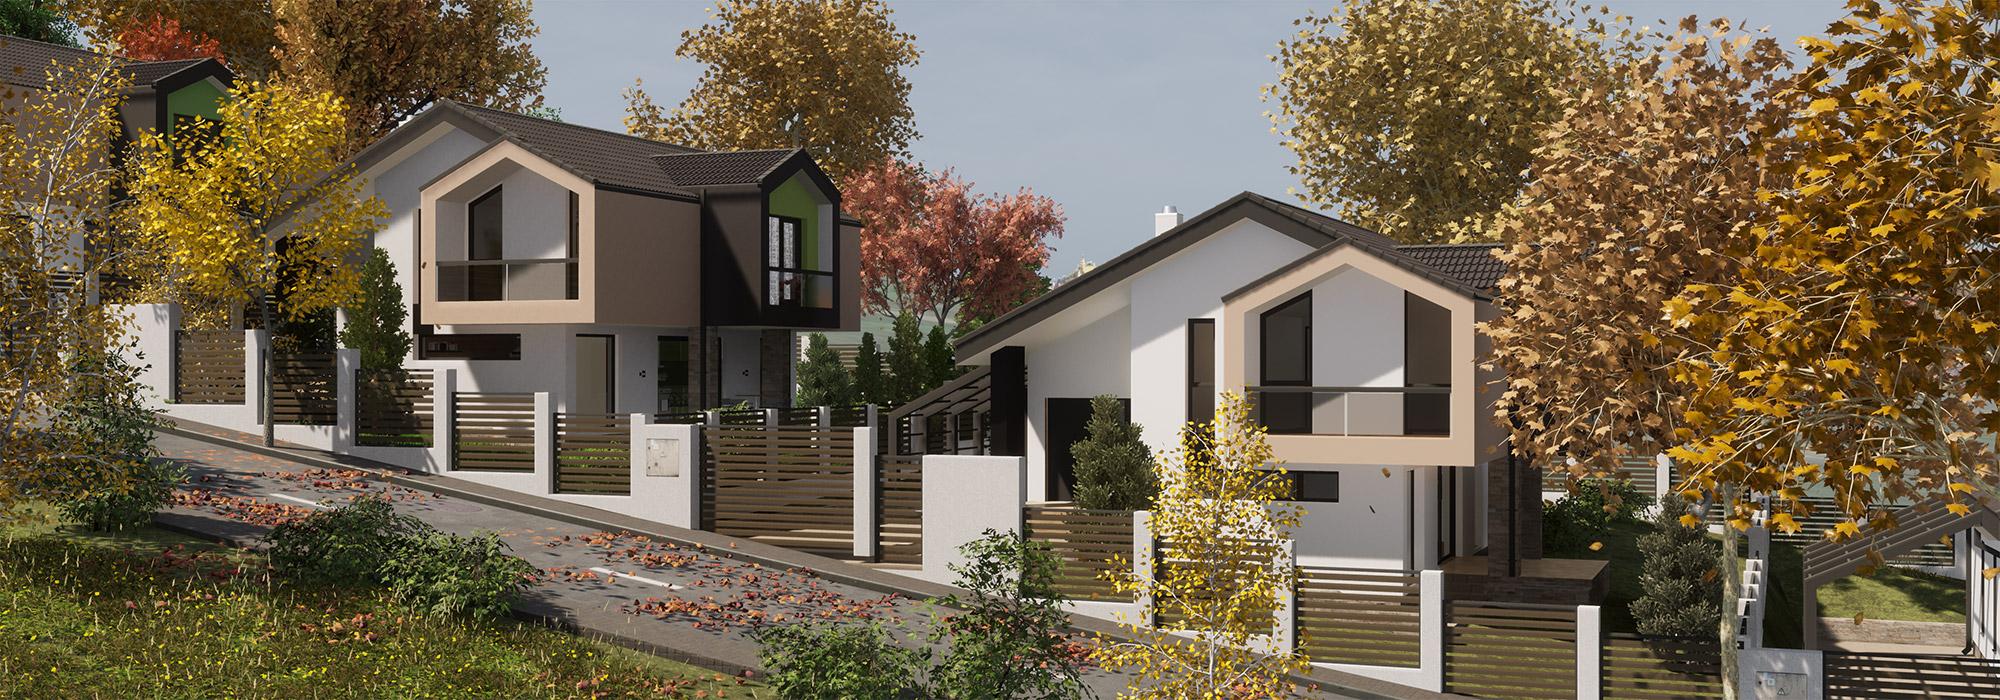 New Individual Houses in Livezeni